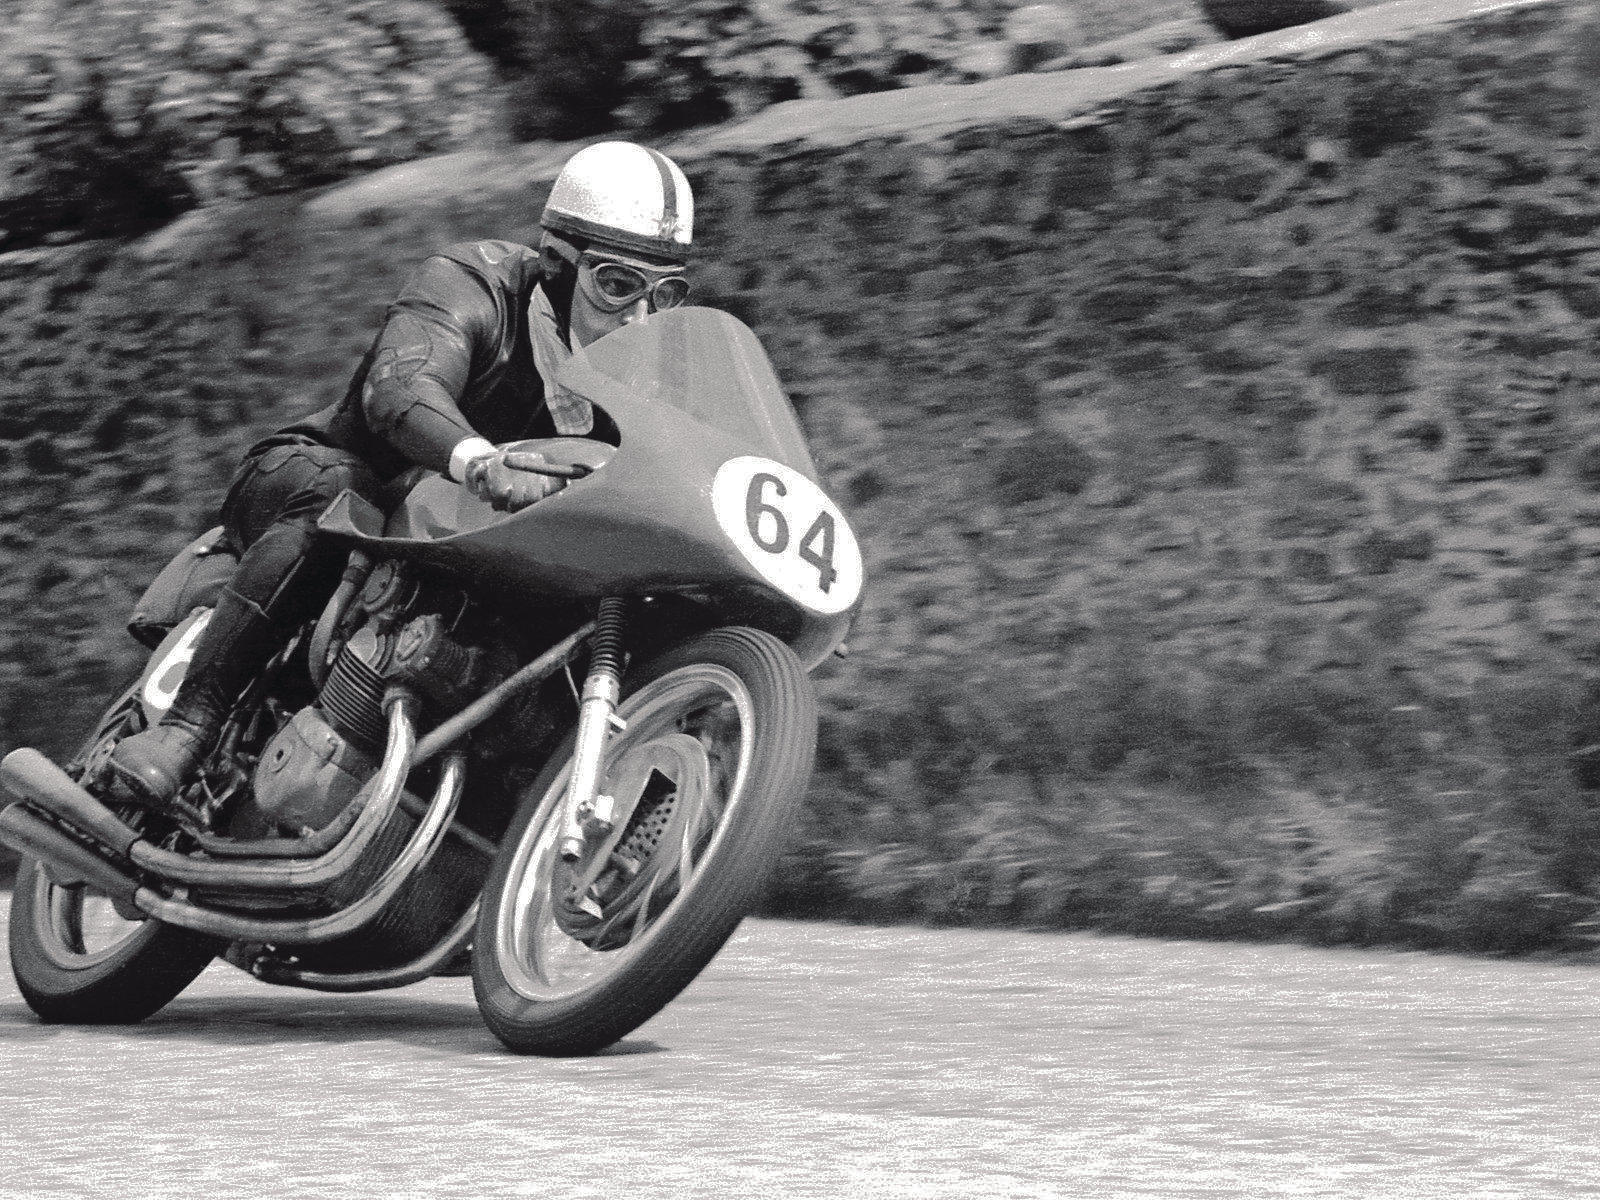 John Surtees seemed untouchable on two wheels.